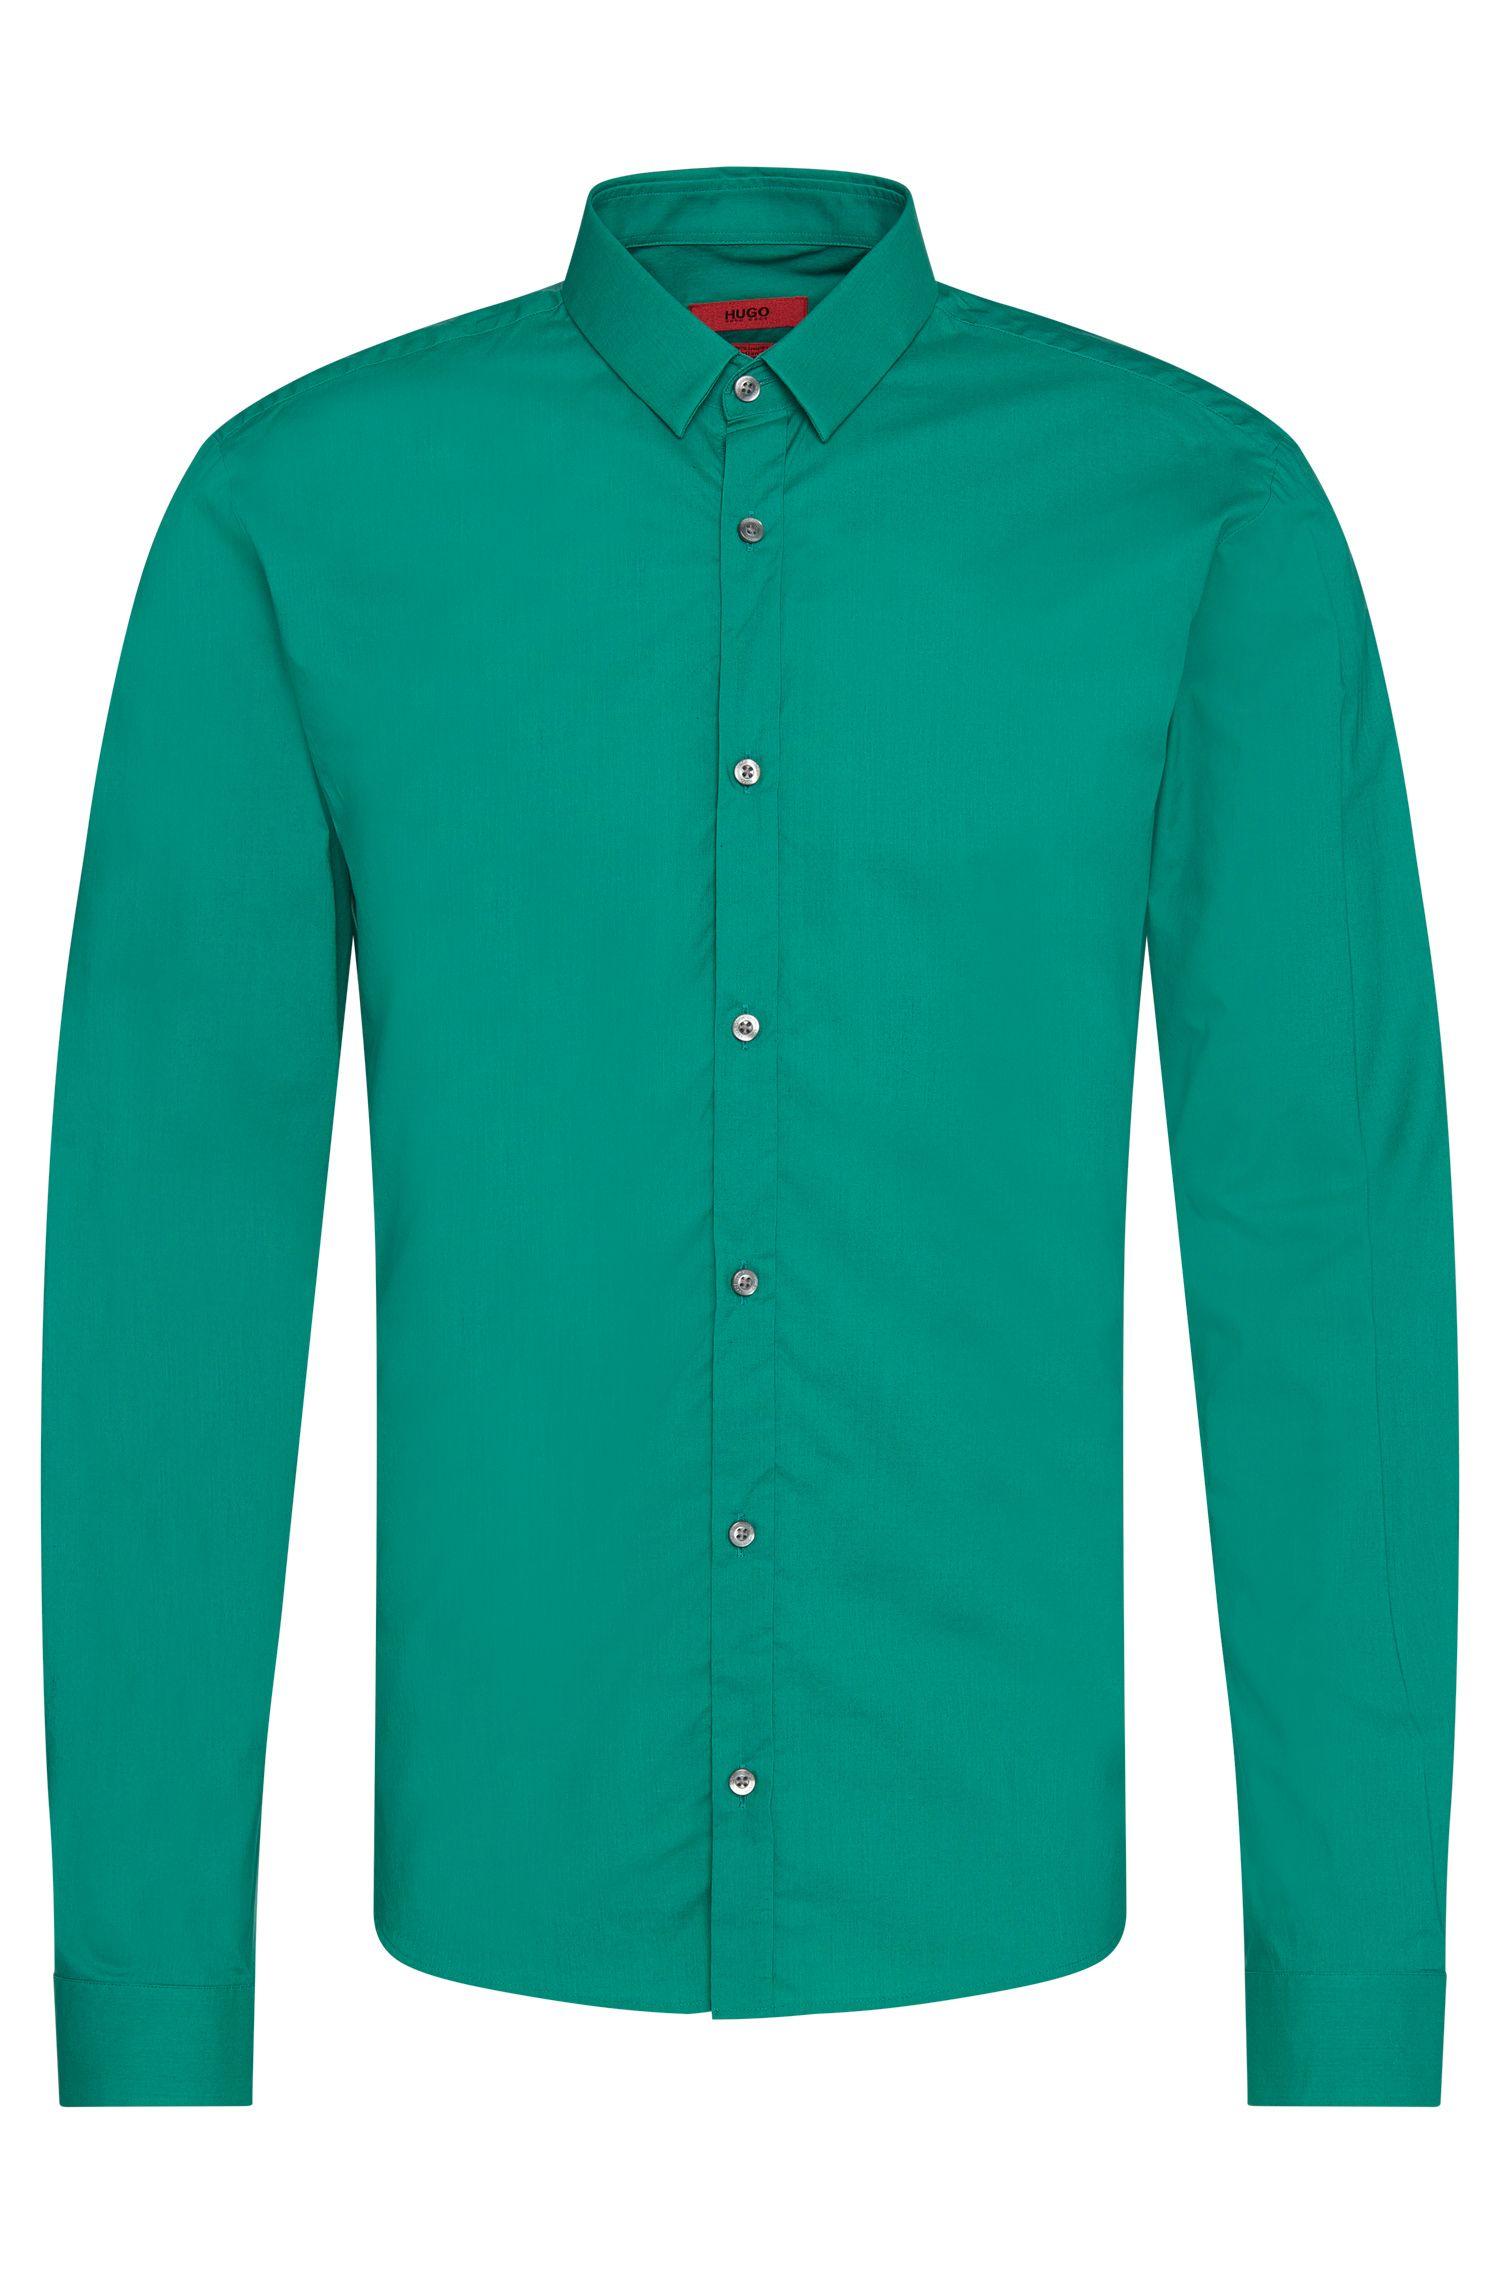 'Ero'   Extra Slim Fit, Cotton Button Down Shirt